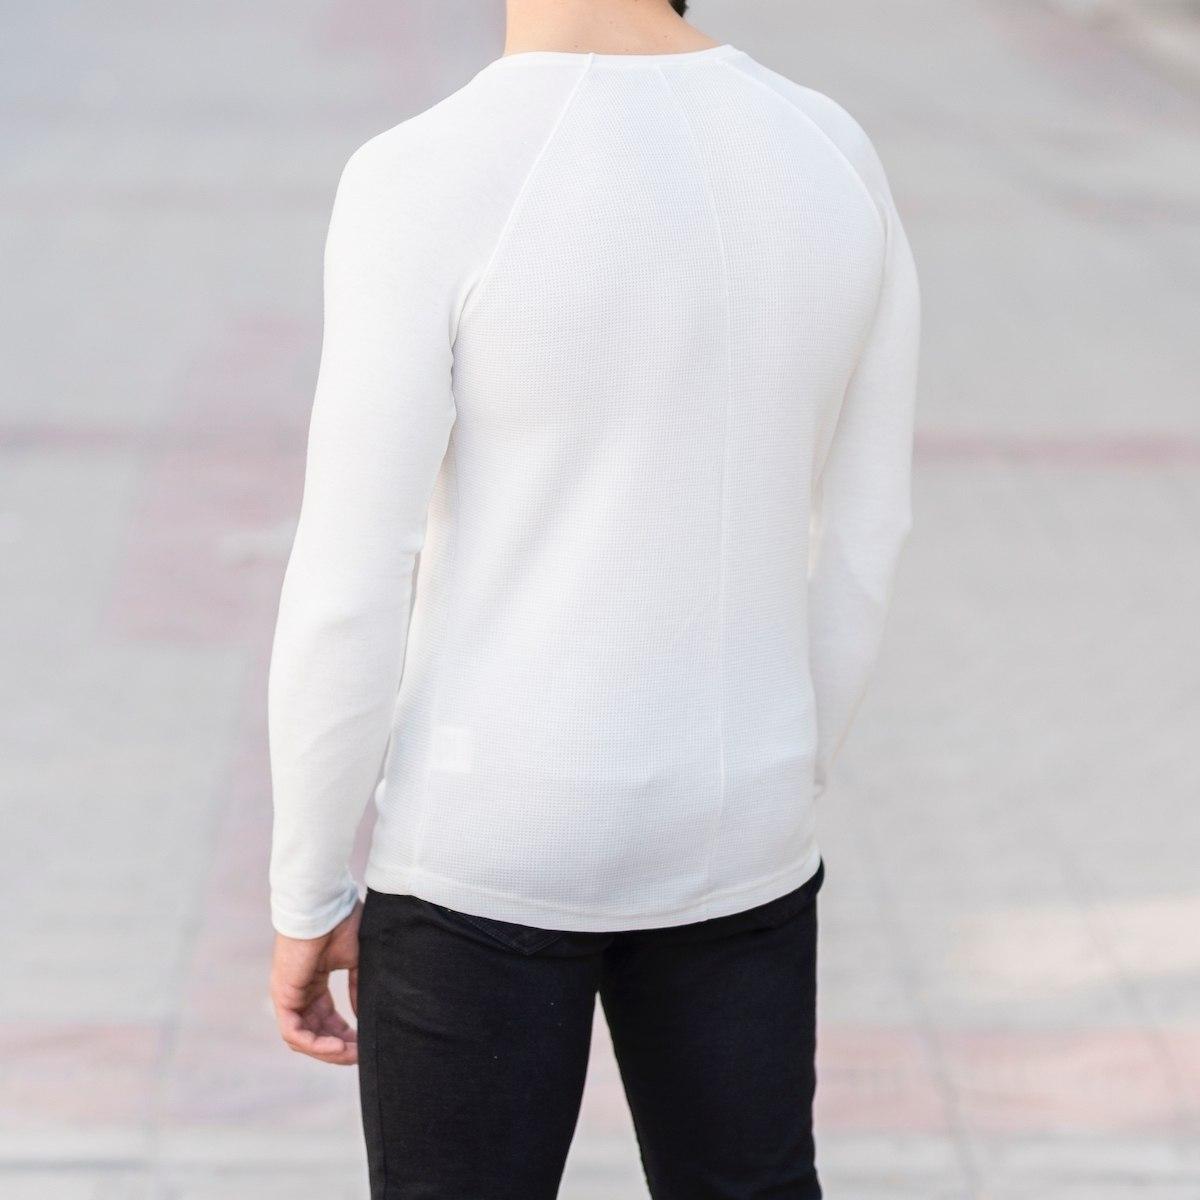 Dotwork Sweatshirt In White Mv Premium Brand - 3